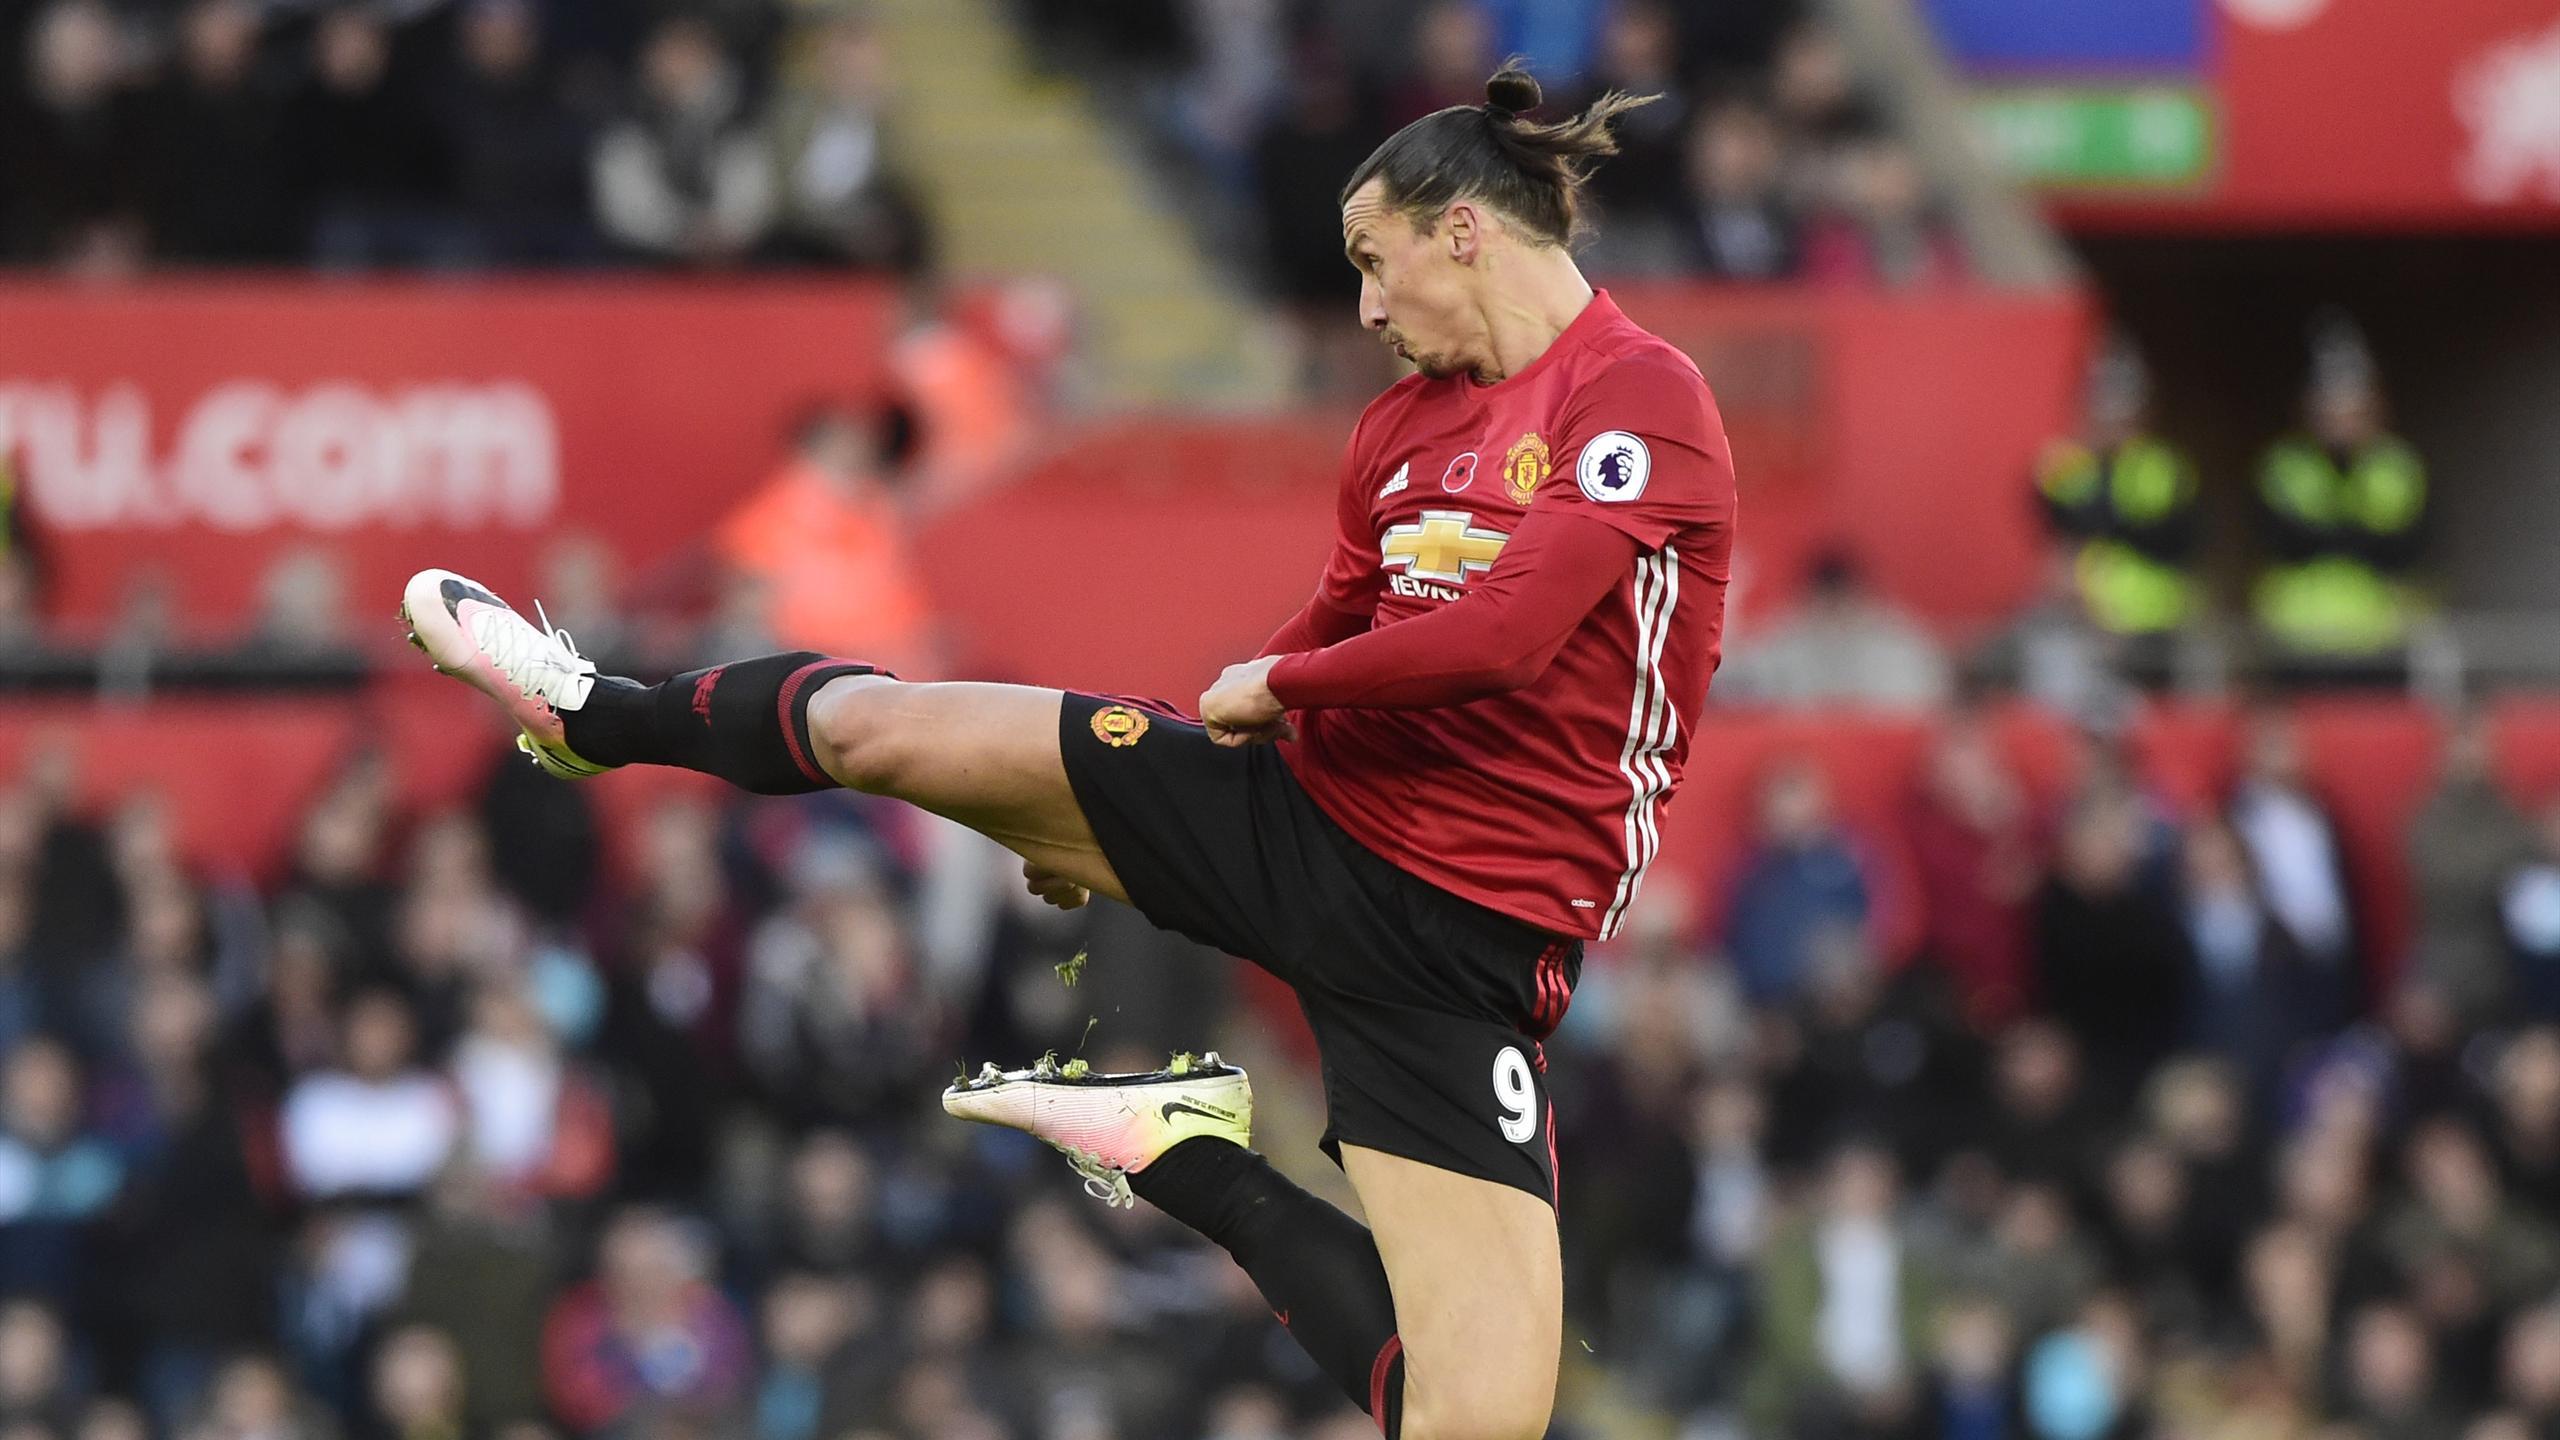 Manchester United's Zlatan Ibrahimovic celebrates scoring their second goal